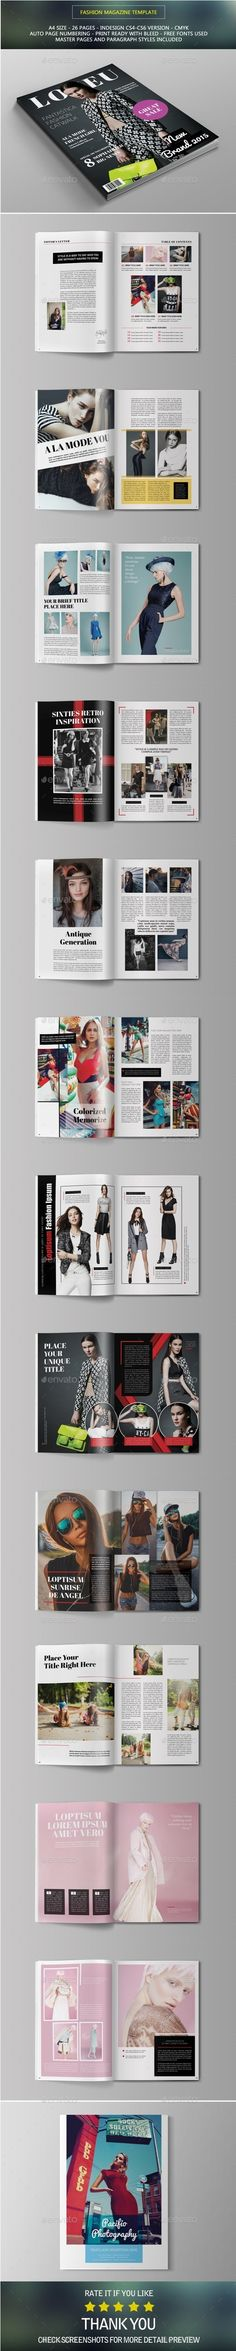 Fashion Magazine Template | #magazinetemplate | Download: http://graphicriver.net/item/fashion-magazine/10426455?ref=ksioks